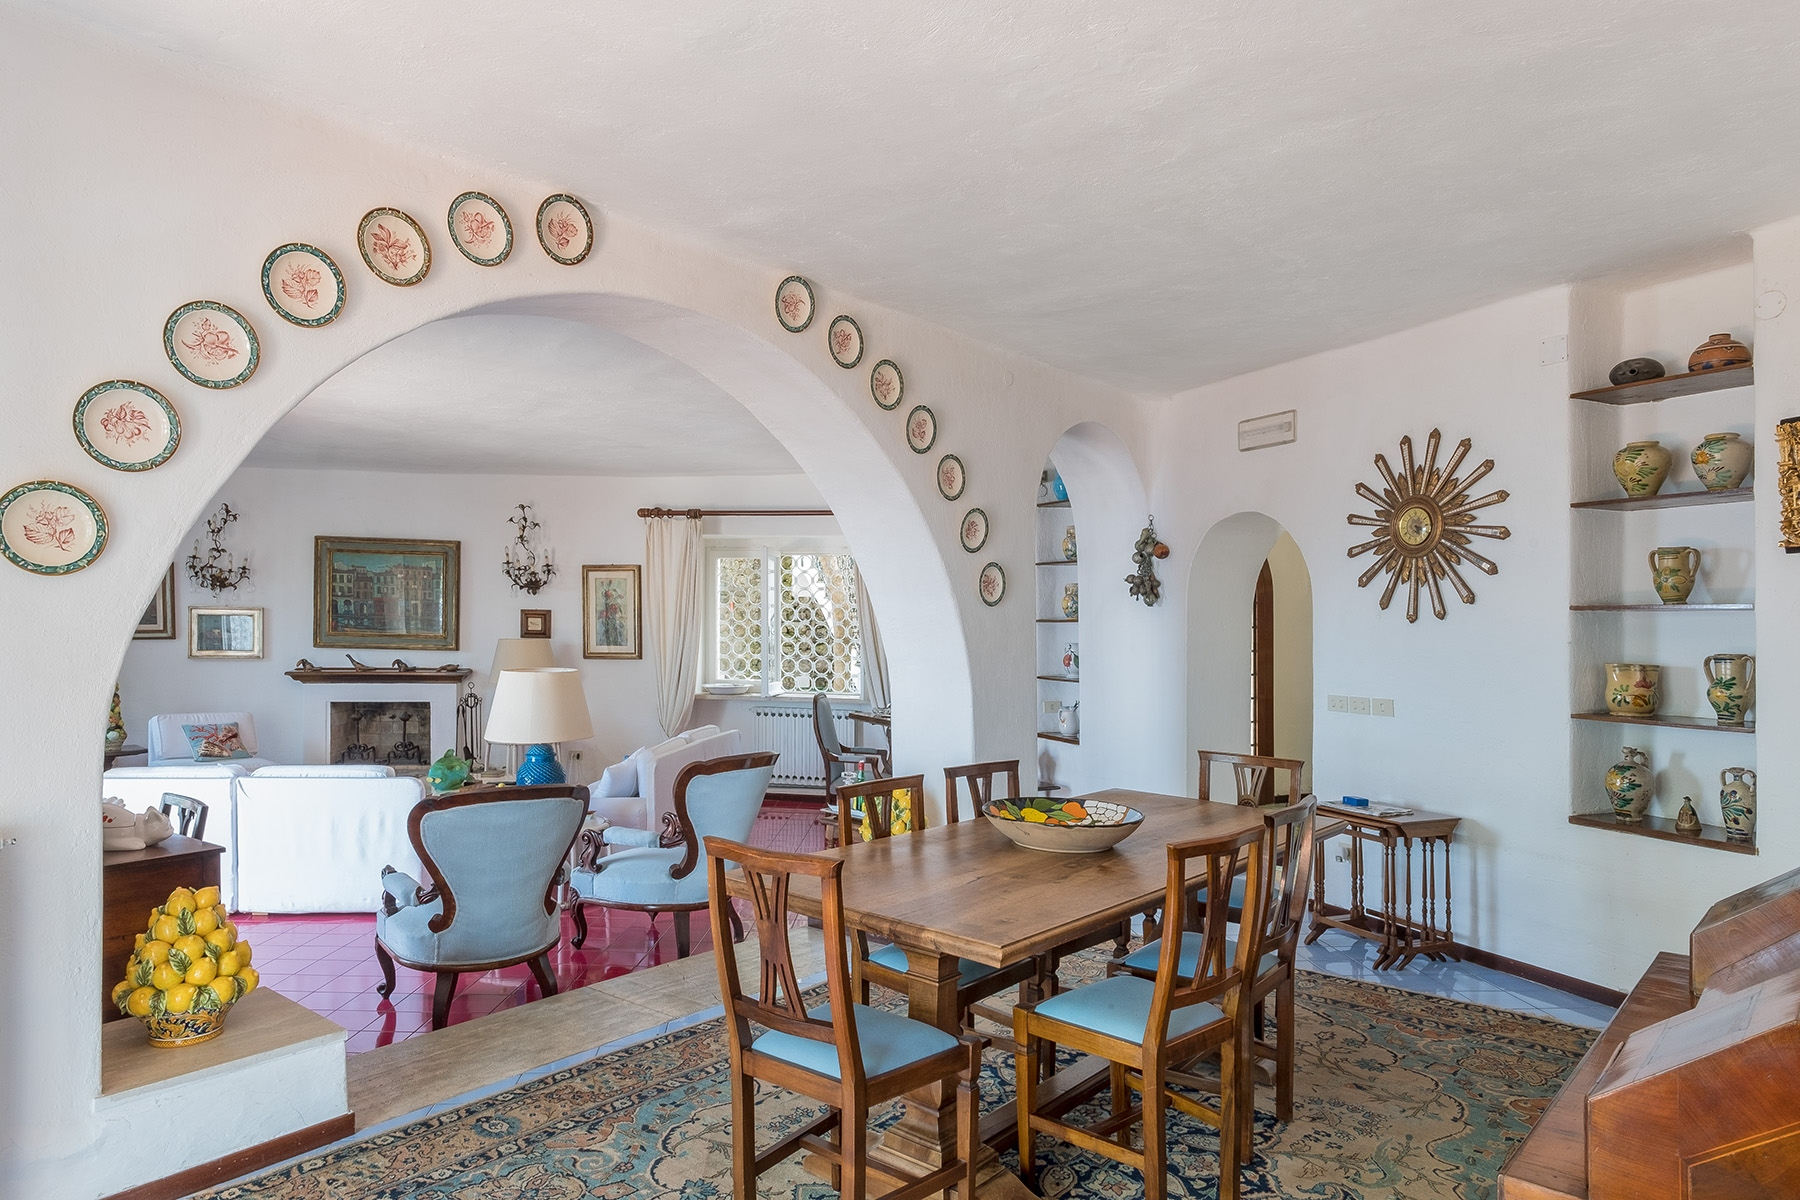 Villa in Vendita a Ischia: 5 locali, 206 mq - Foto 4